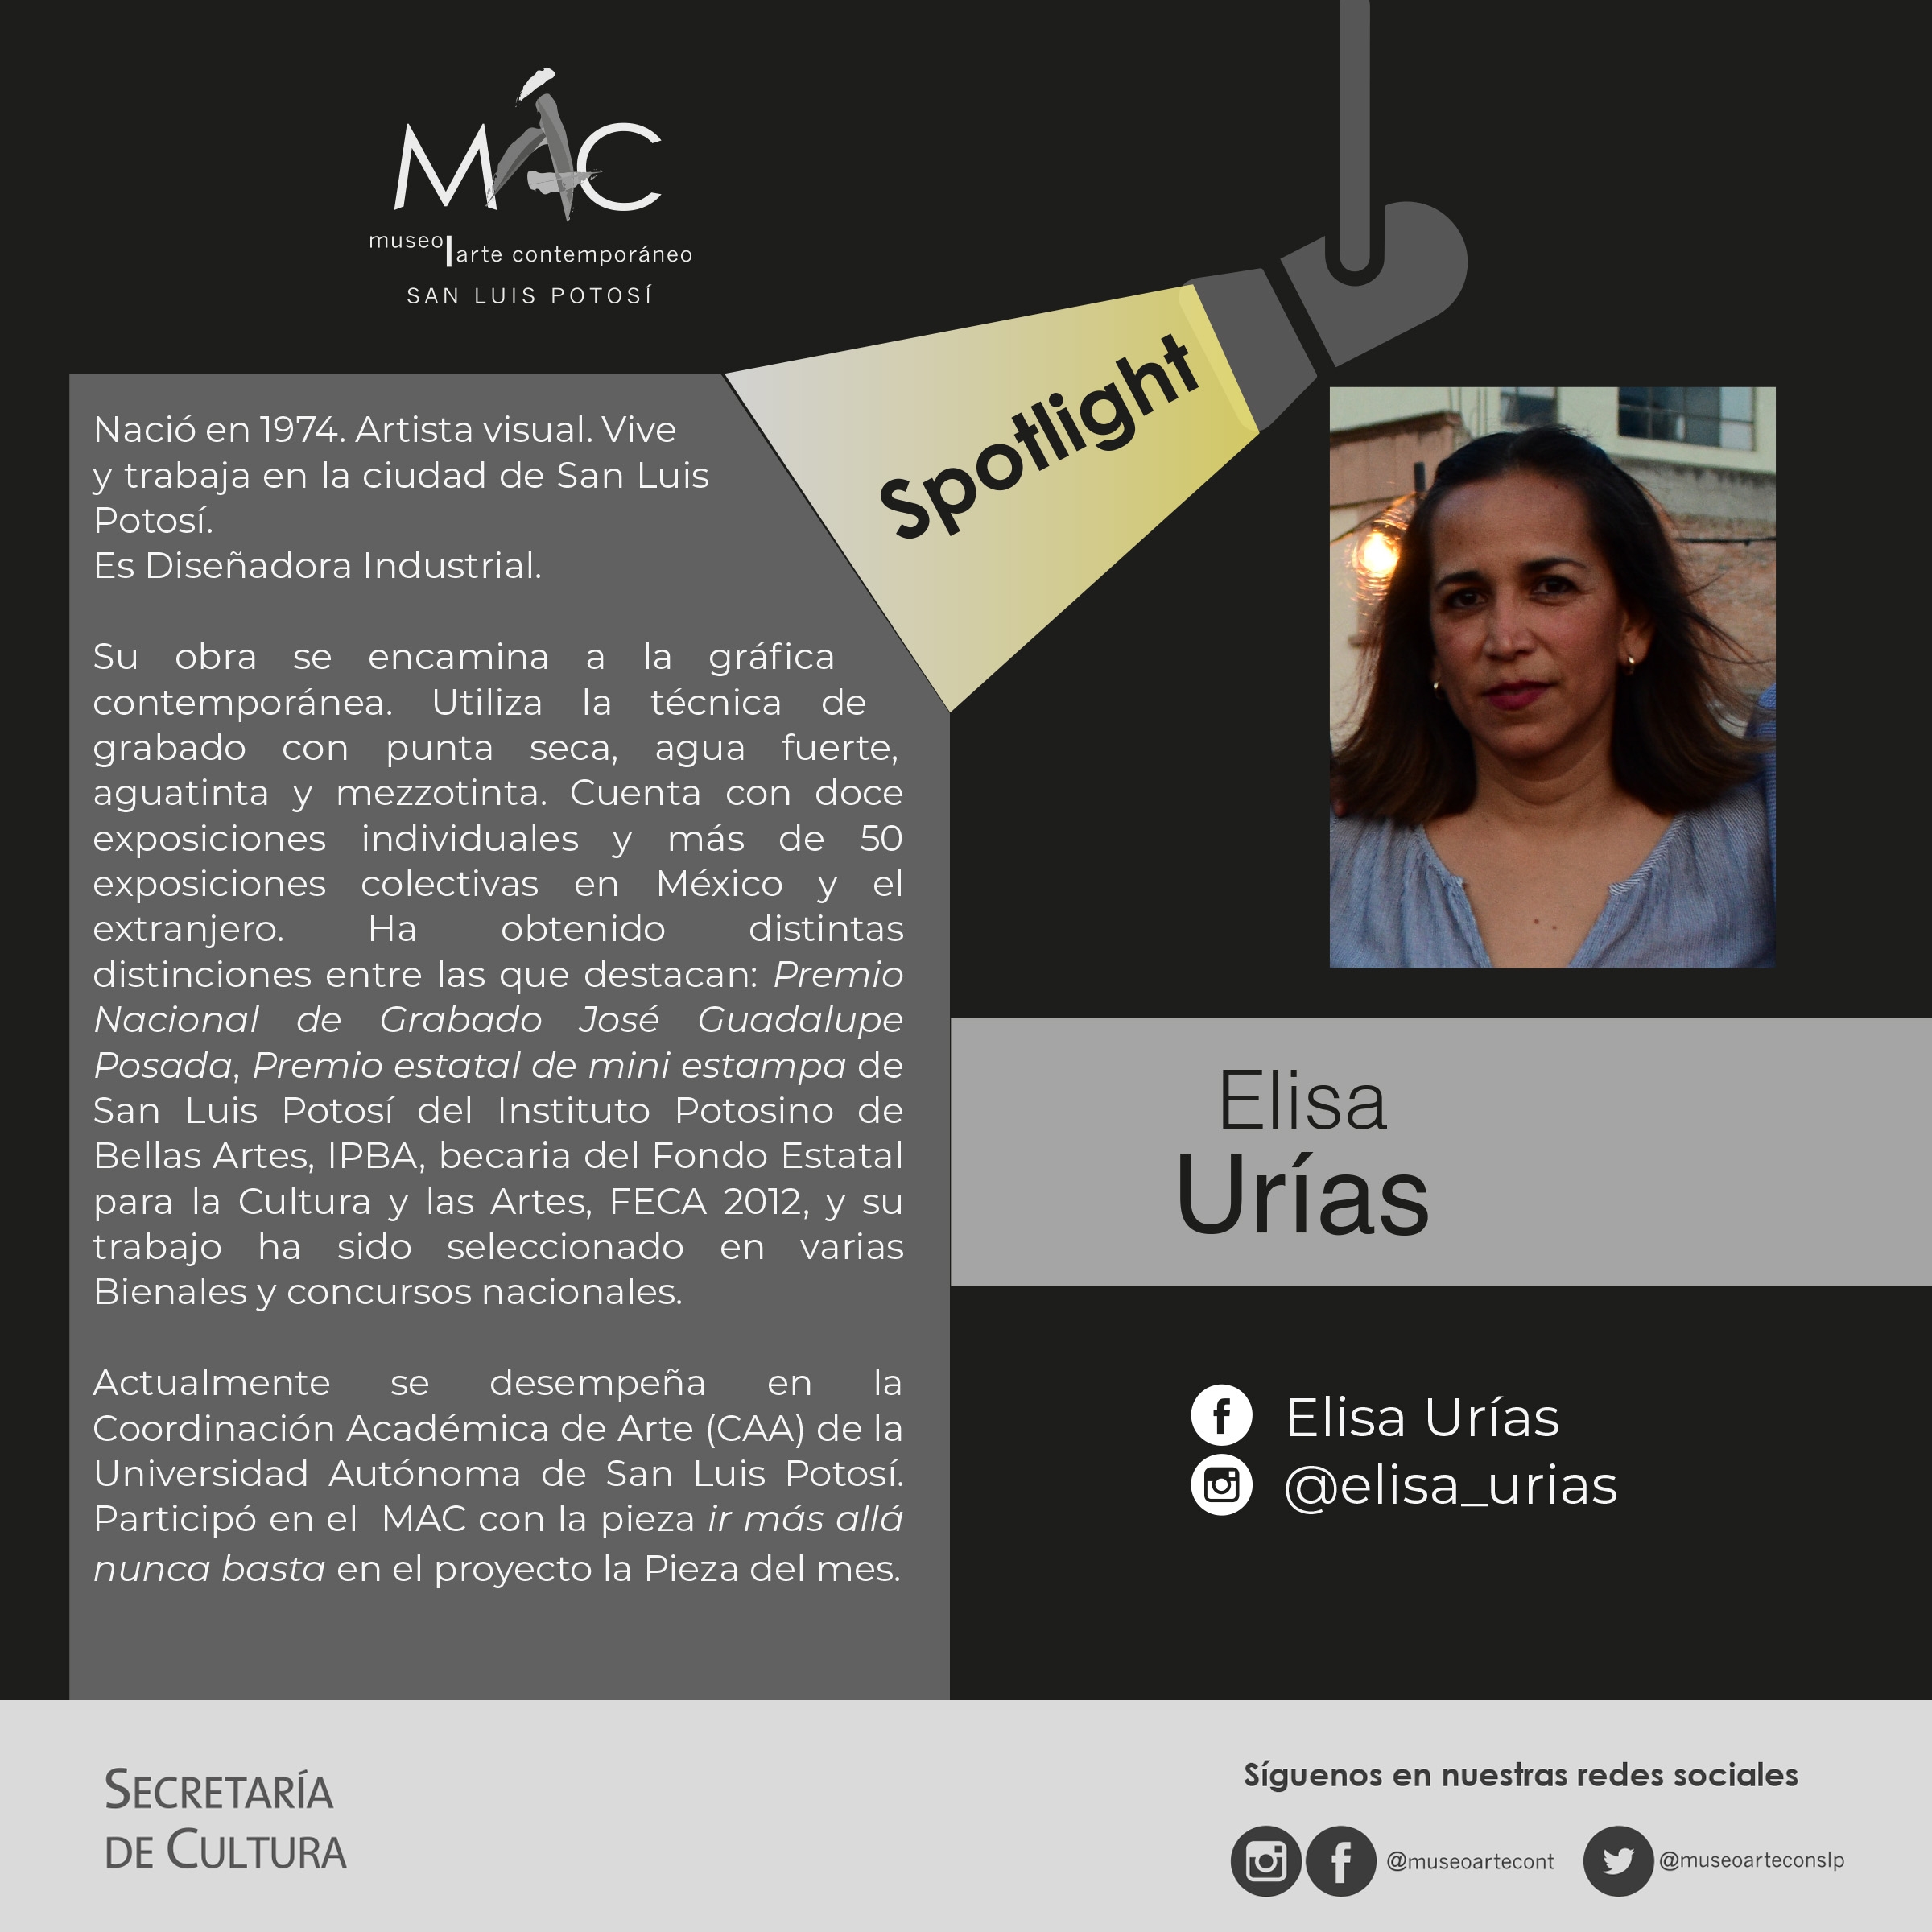 elisa_urias